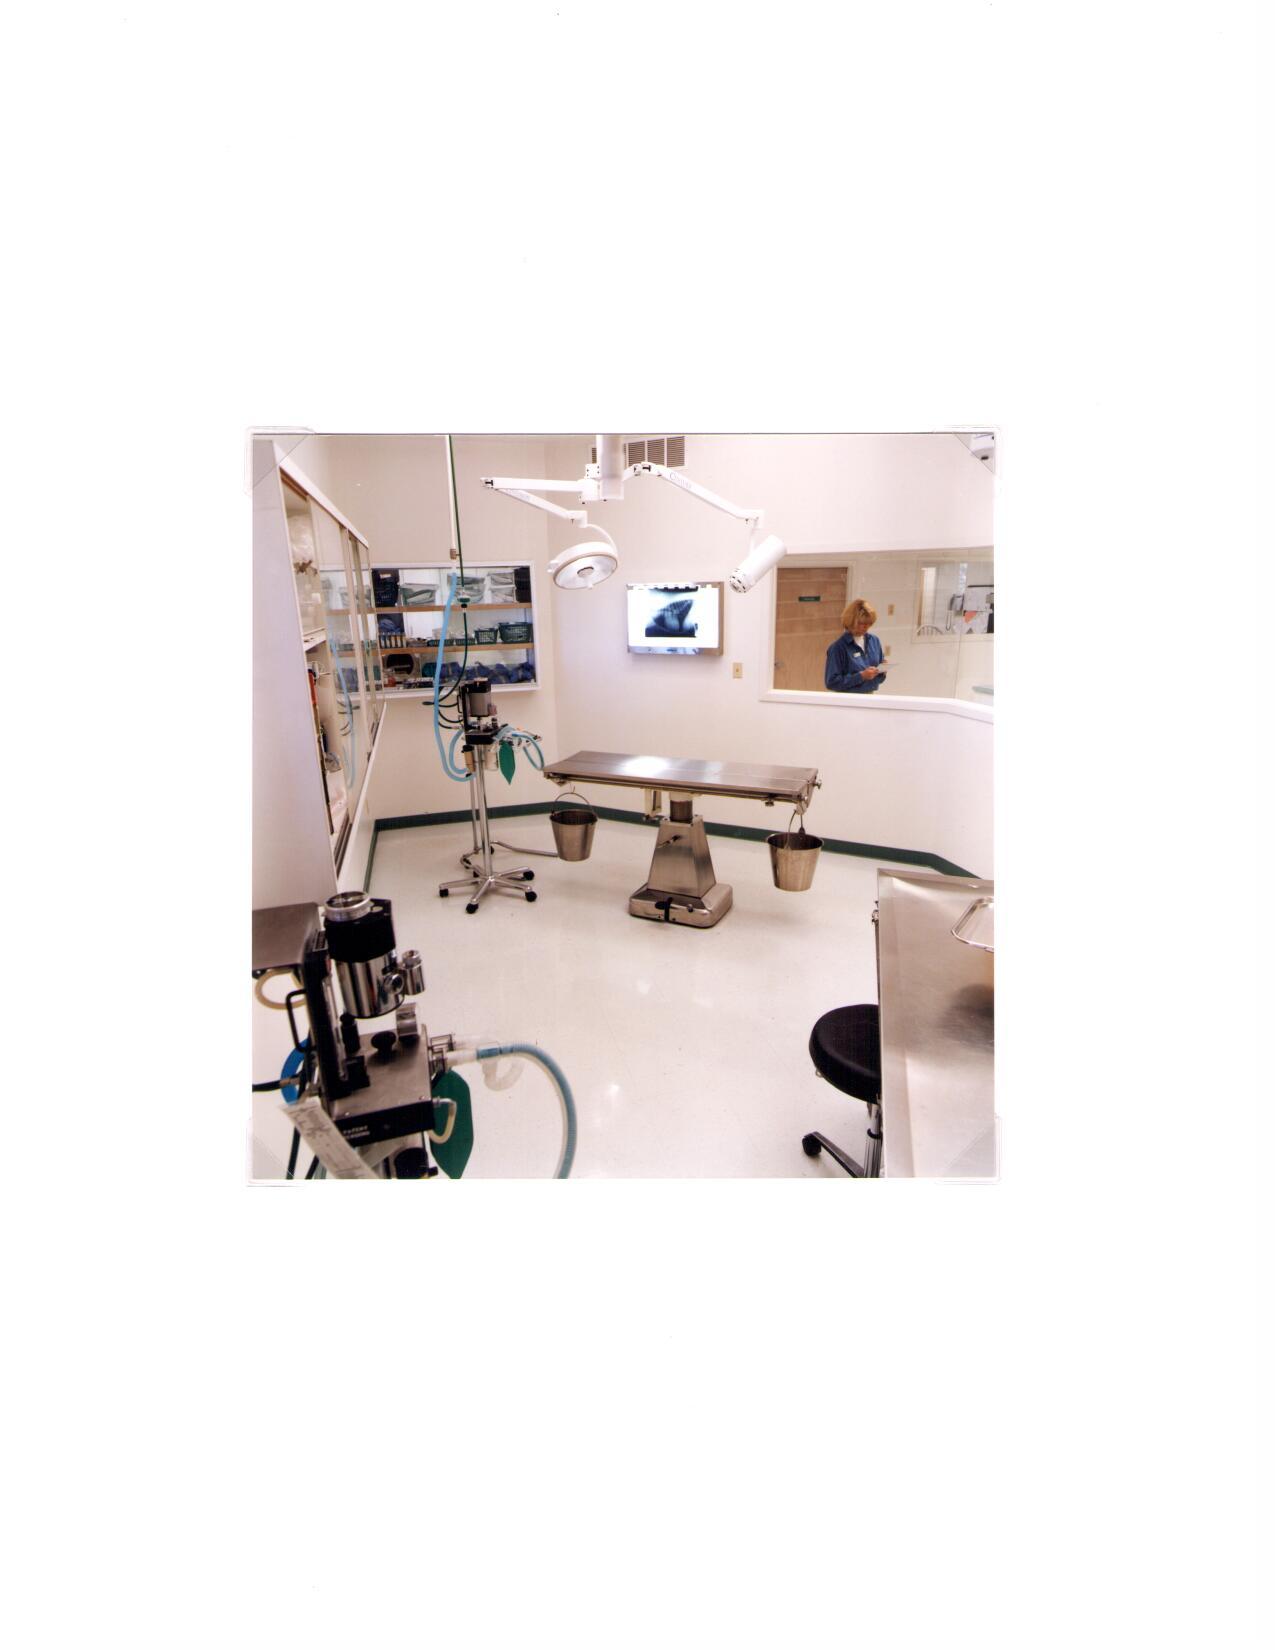 VCA Findlay Animal Hospital image 4